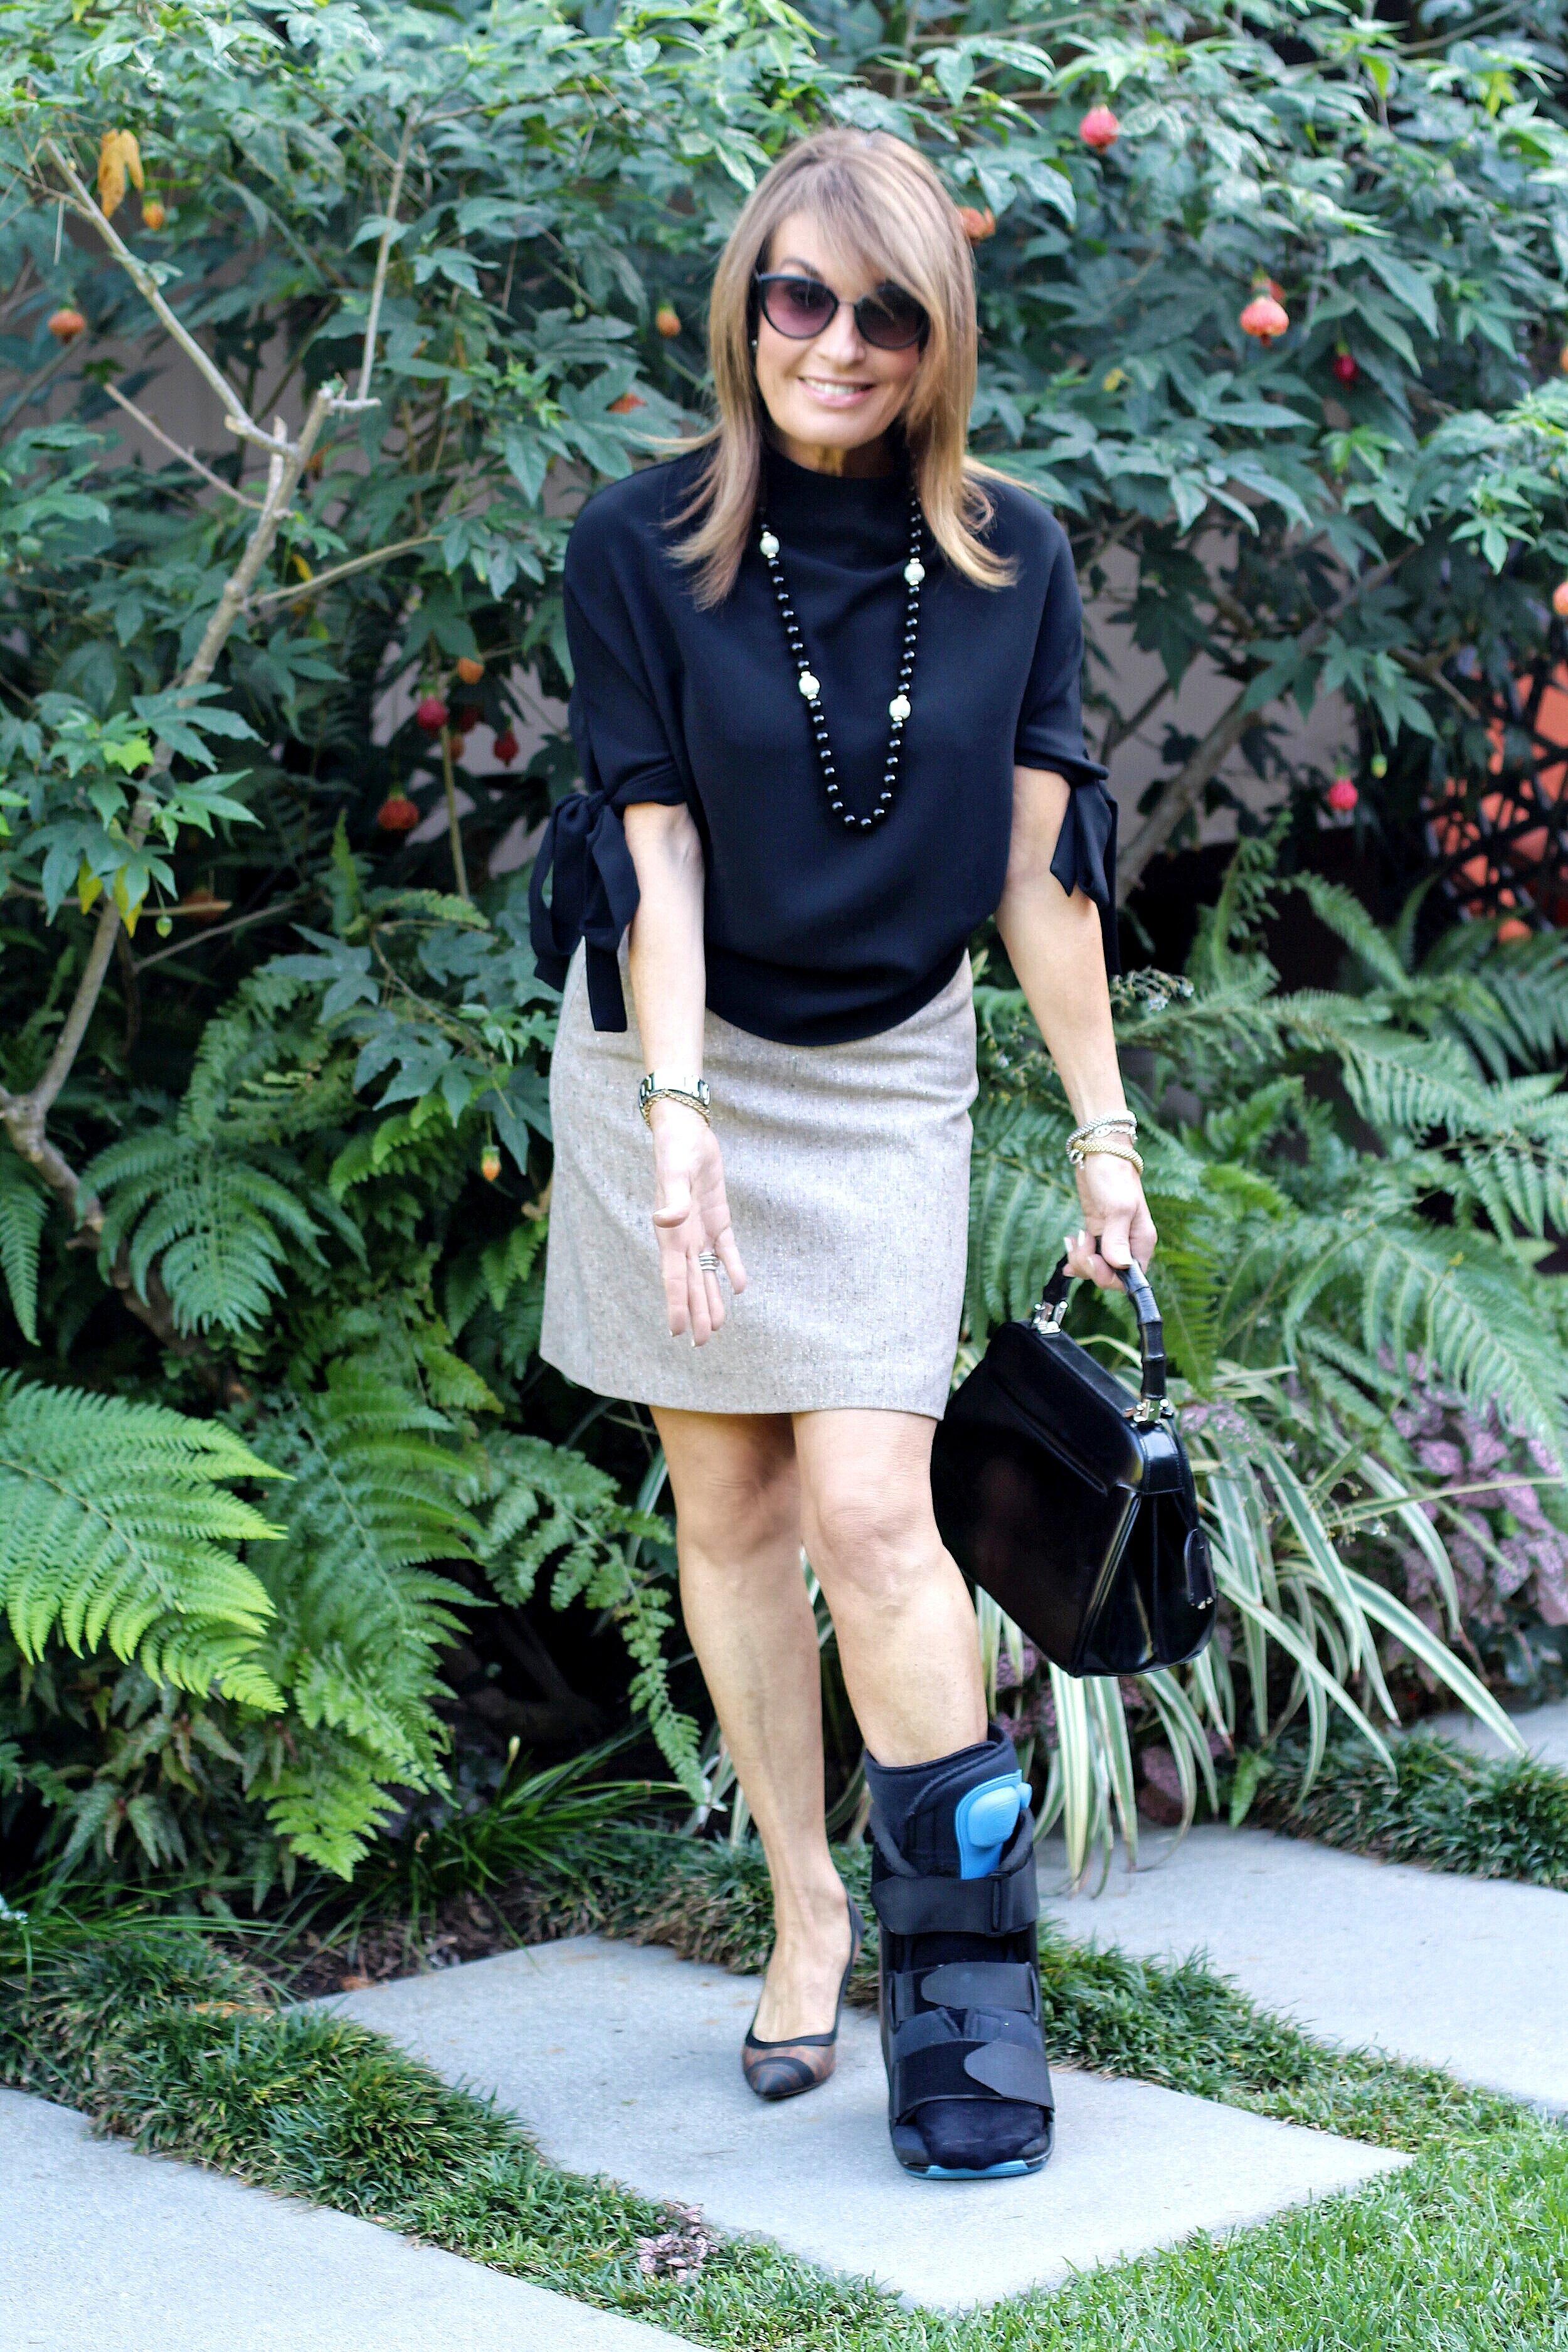 Edeline Lee top    ,    Theory skirt     ,      Fendi shoes     ,   Vintage Gucci handbag, vintage necklace,    Chanel shades similar here